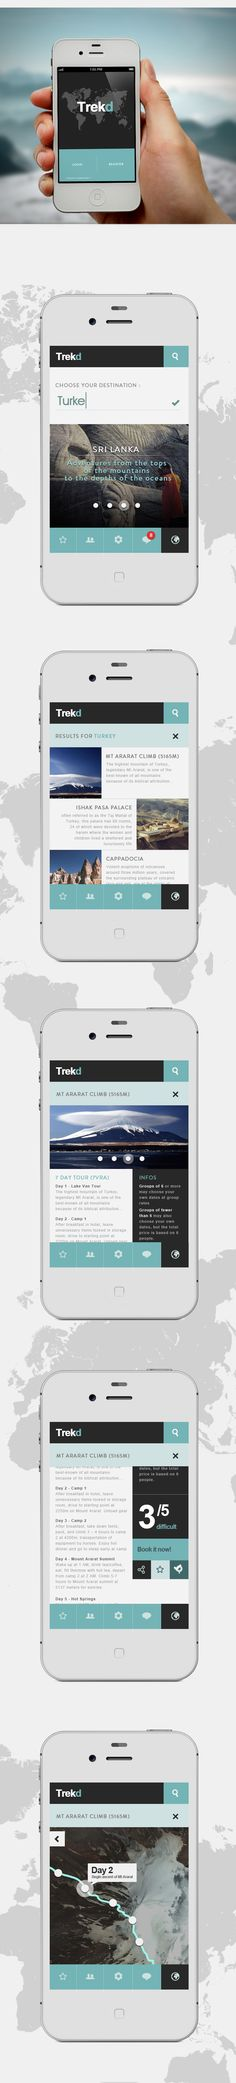 Trekd (app concept) | Designer: Thomas Le Corre